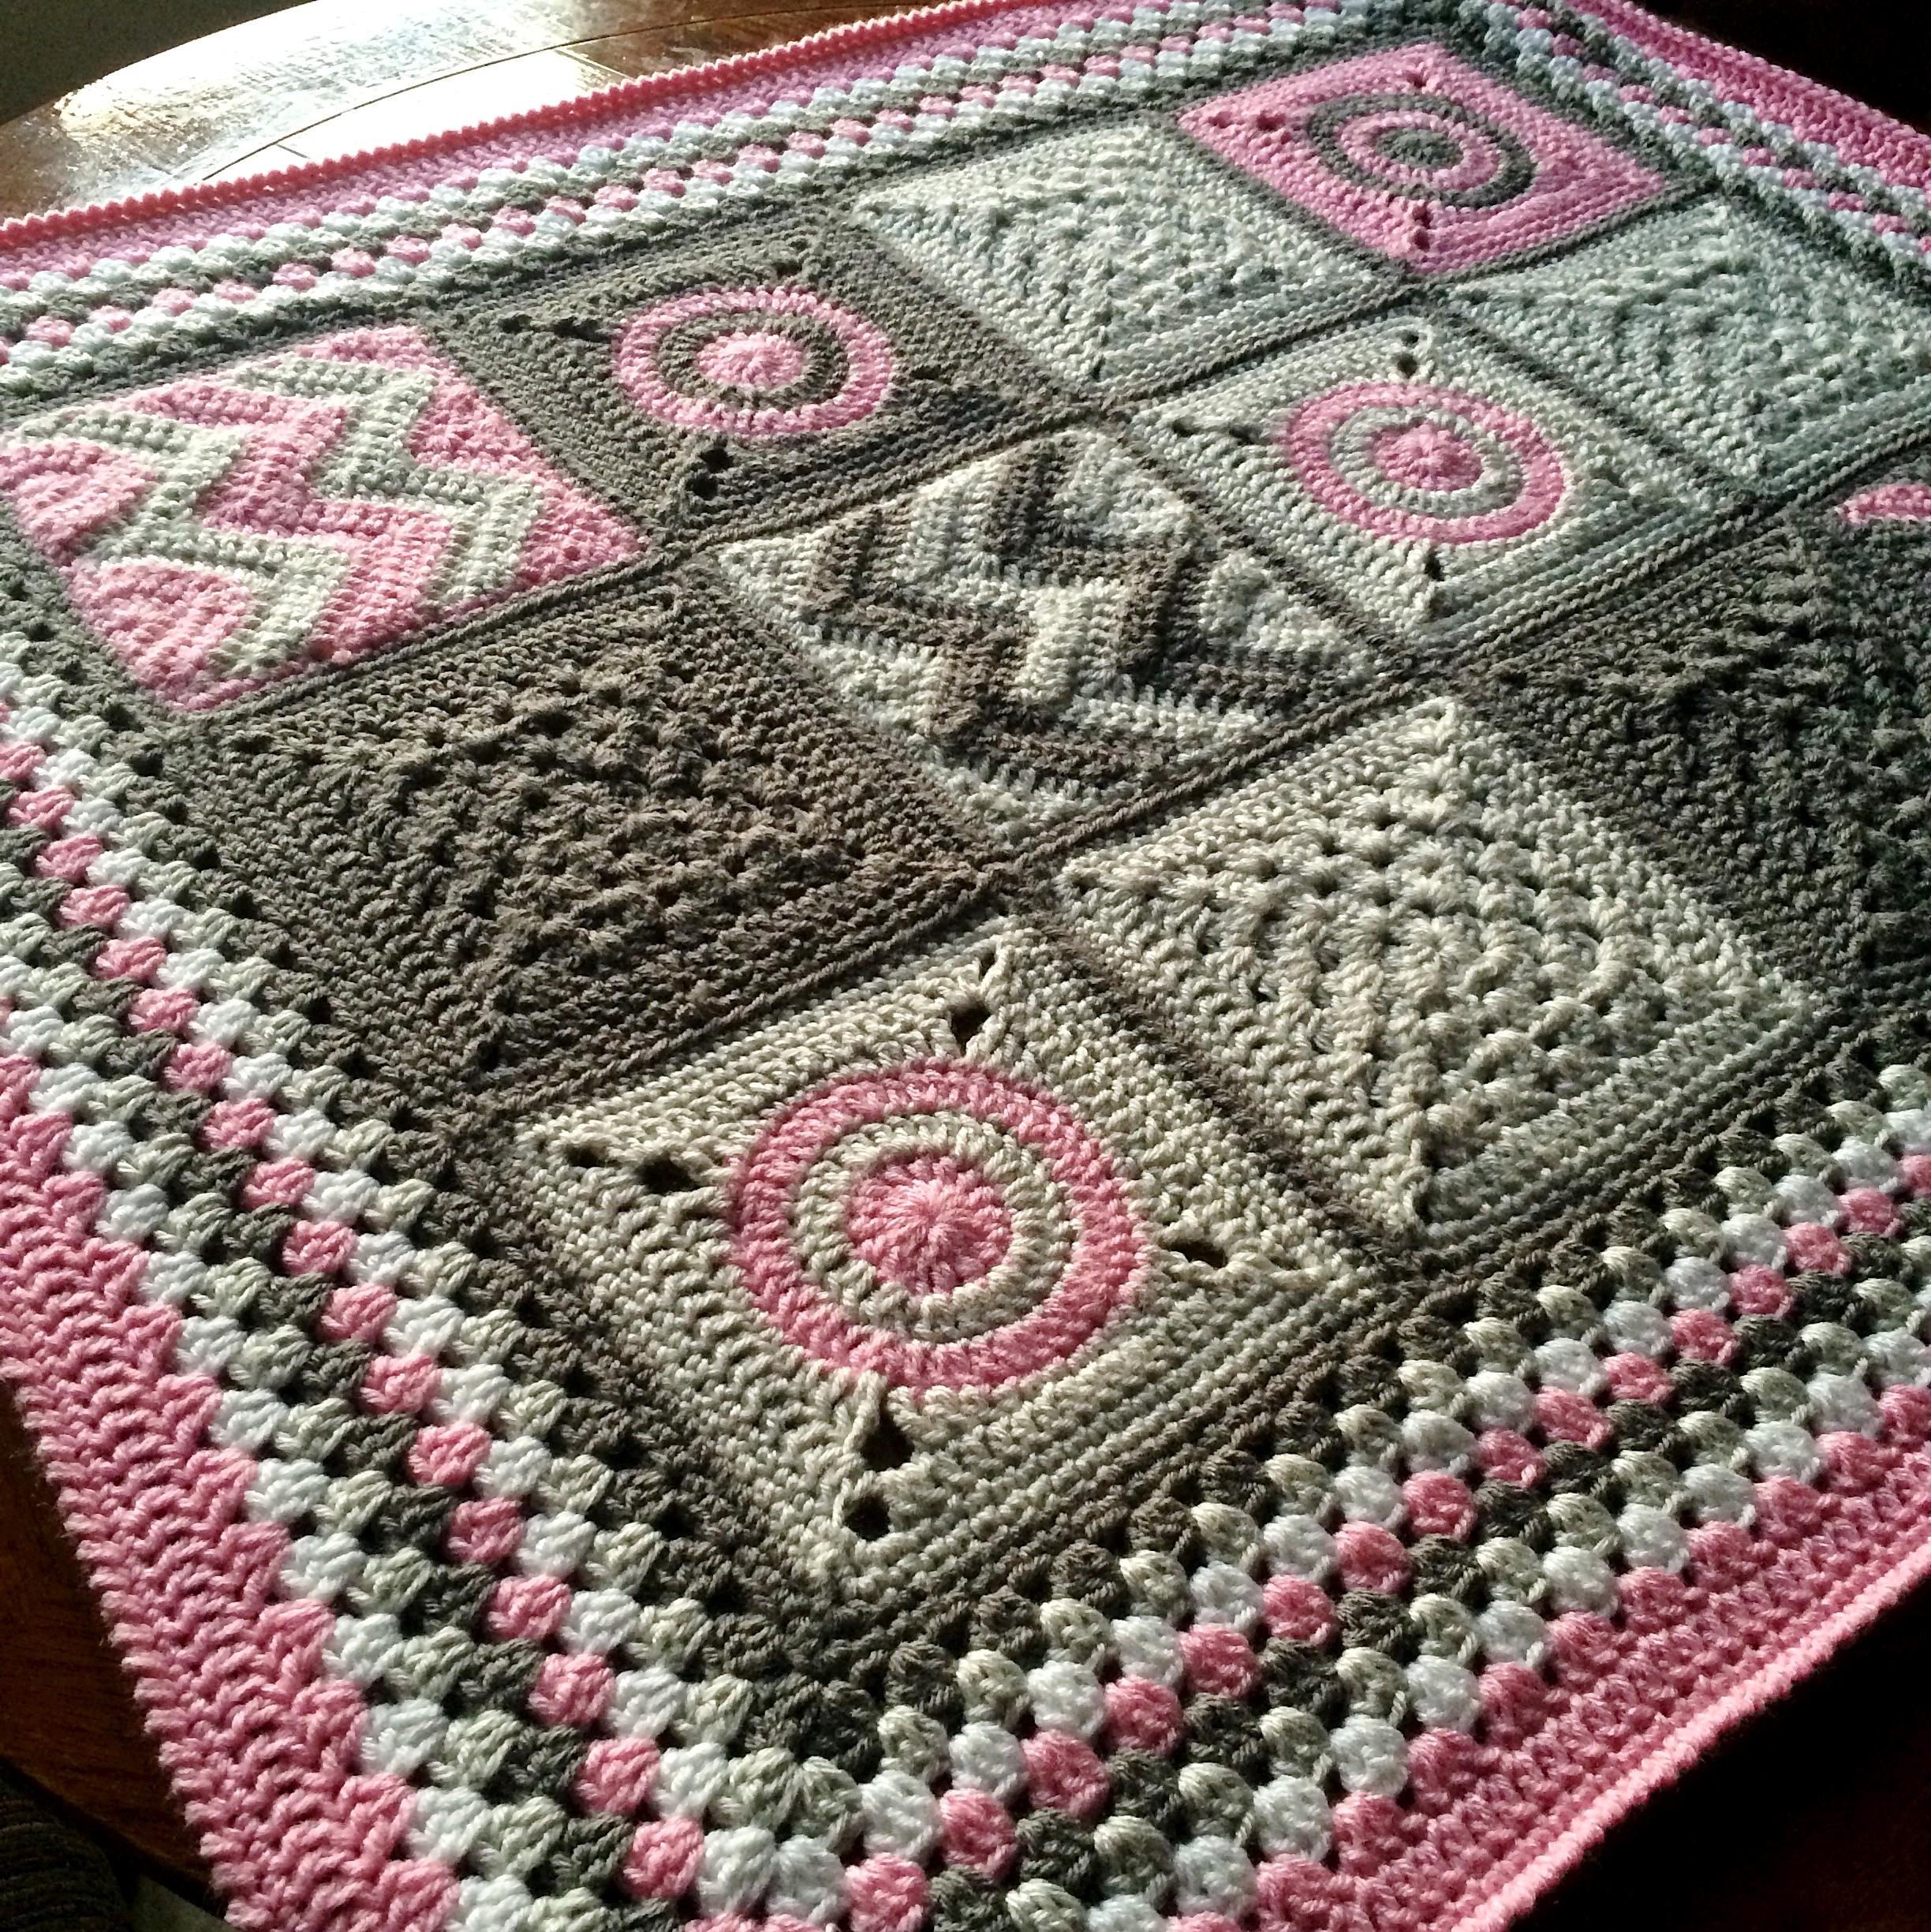 Crochet Baby Blanket Pattern Modern Patchwork Cypresstextiles